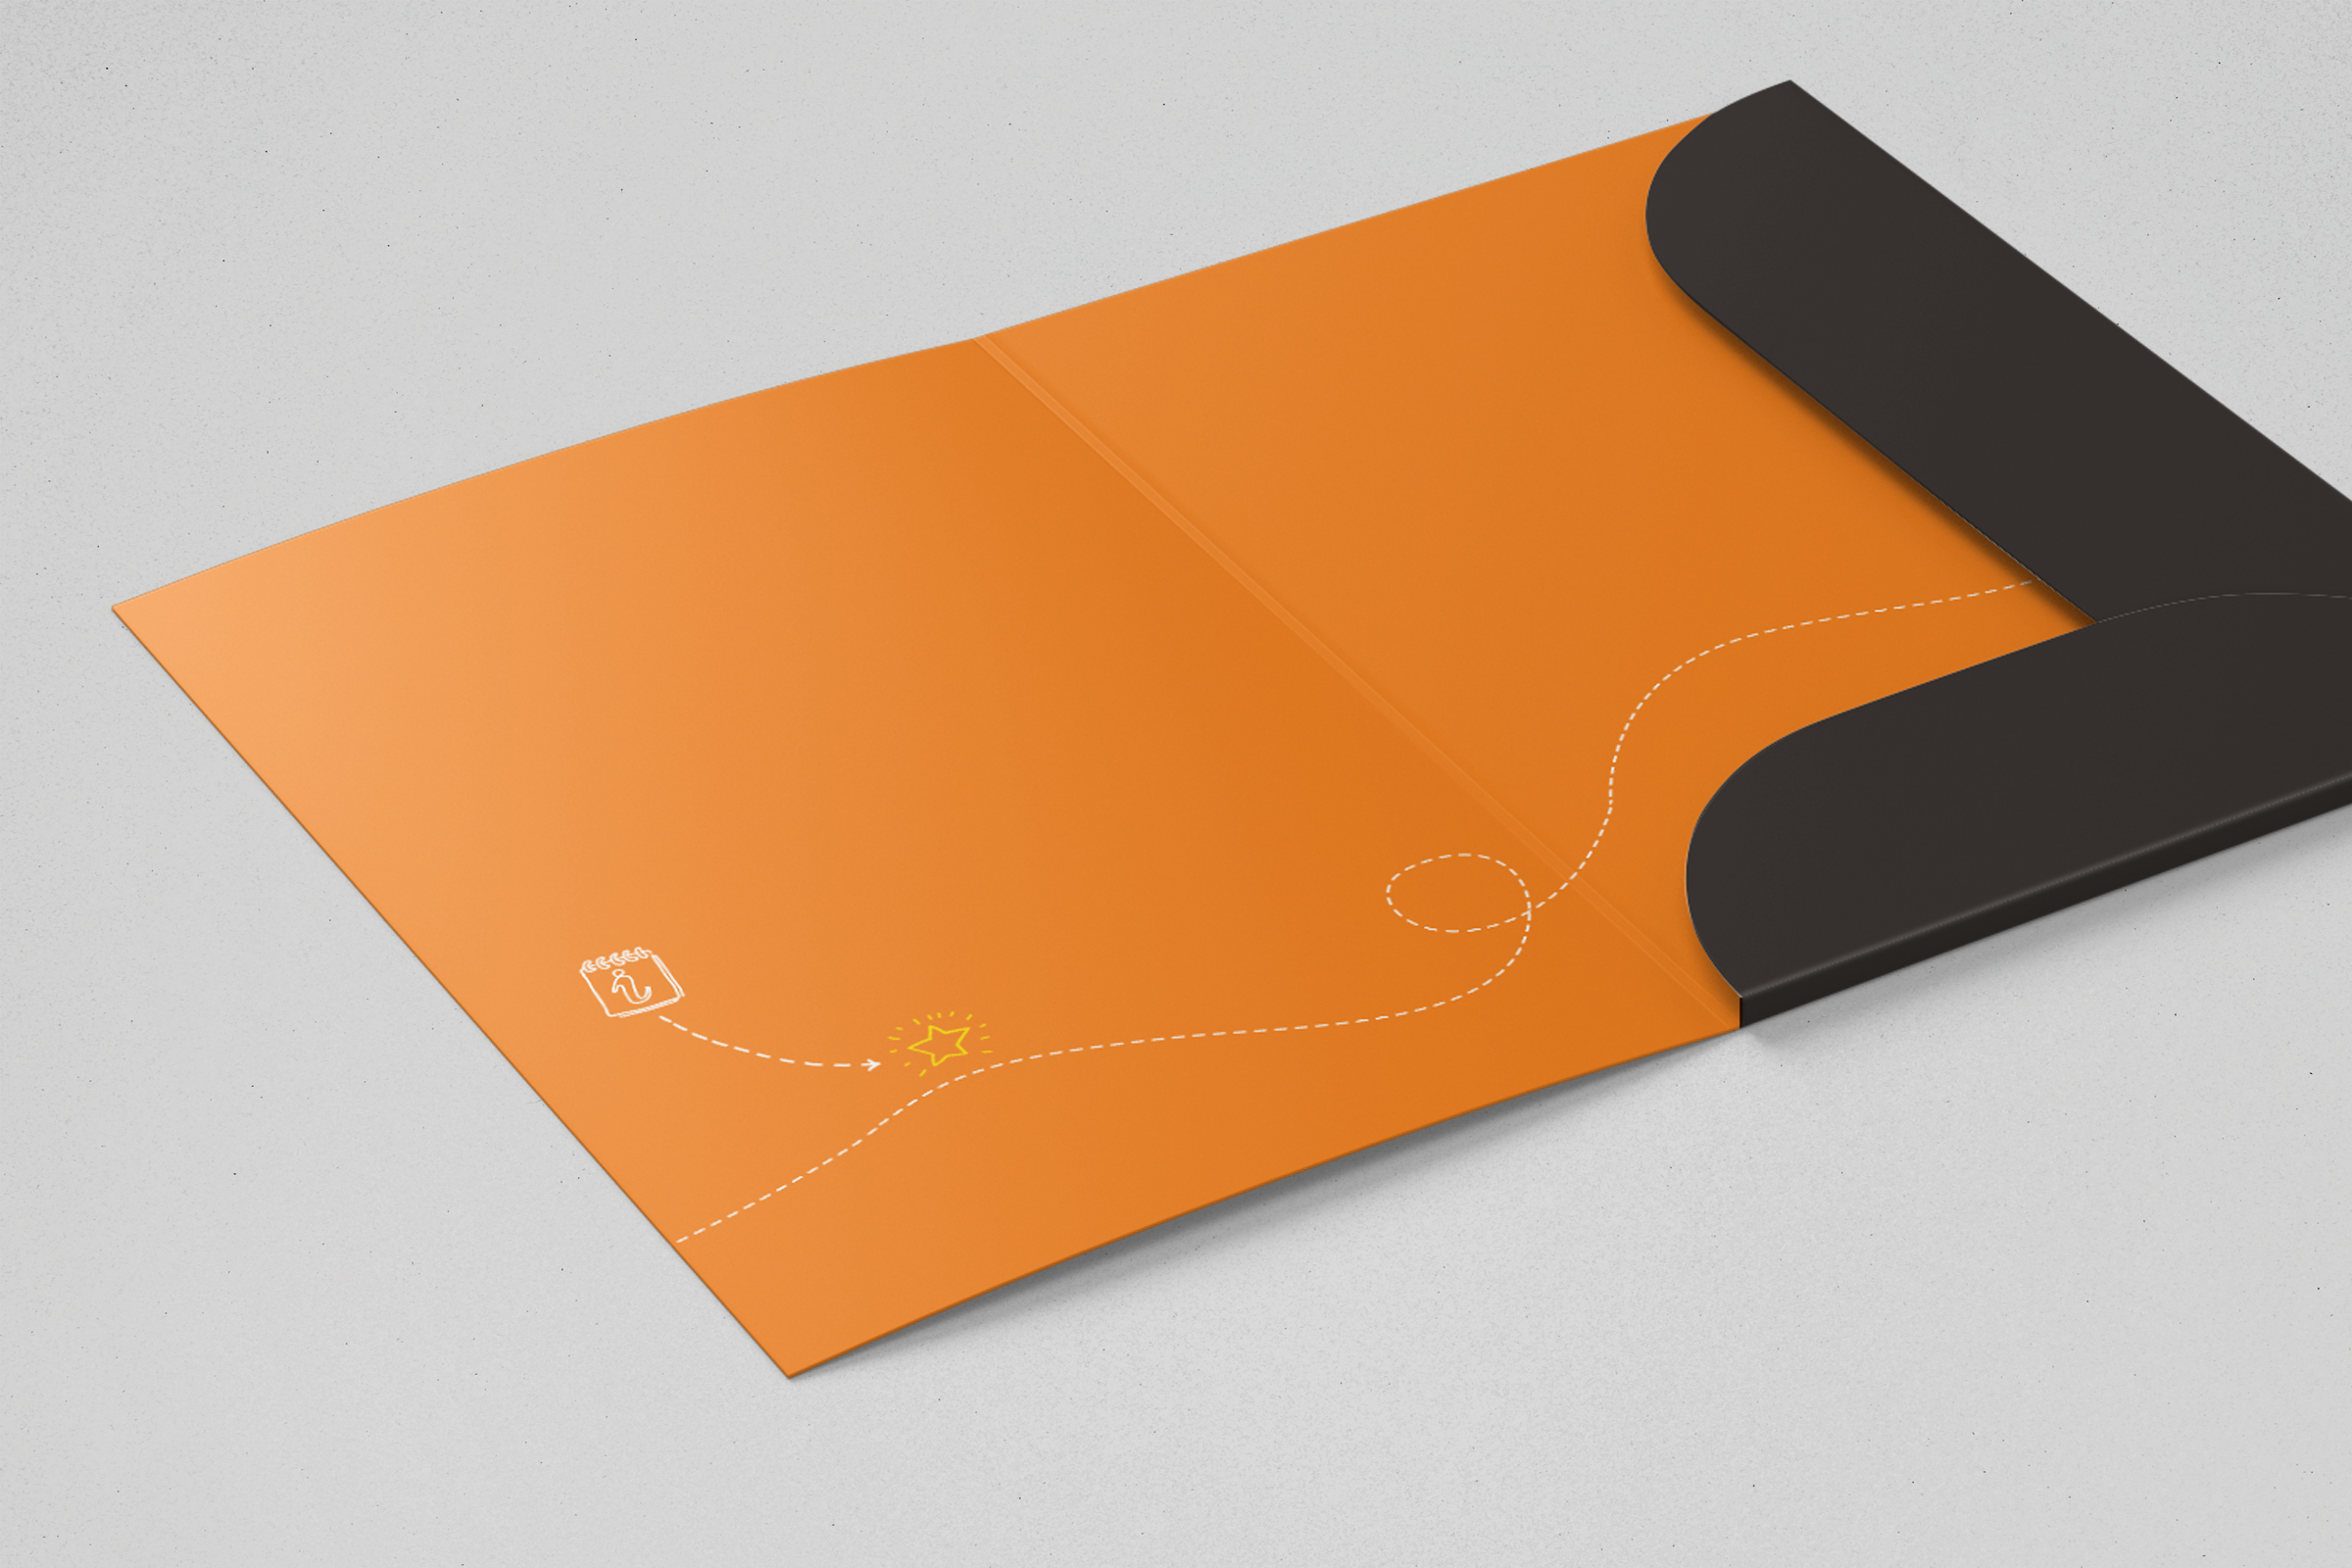 yorganop-print-design-folder-1